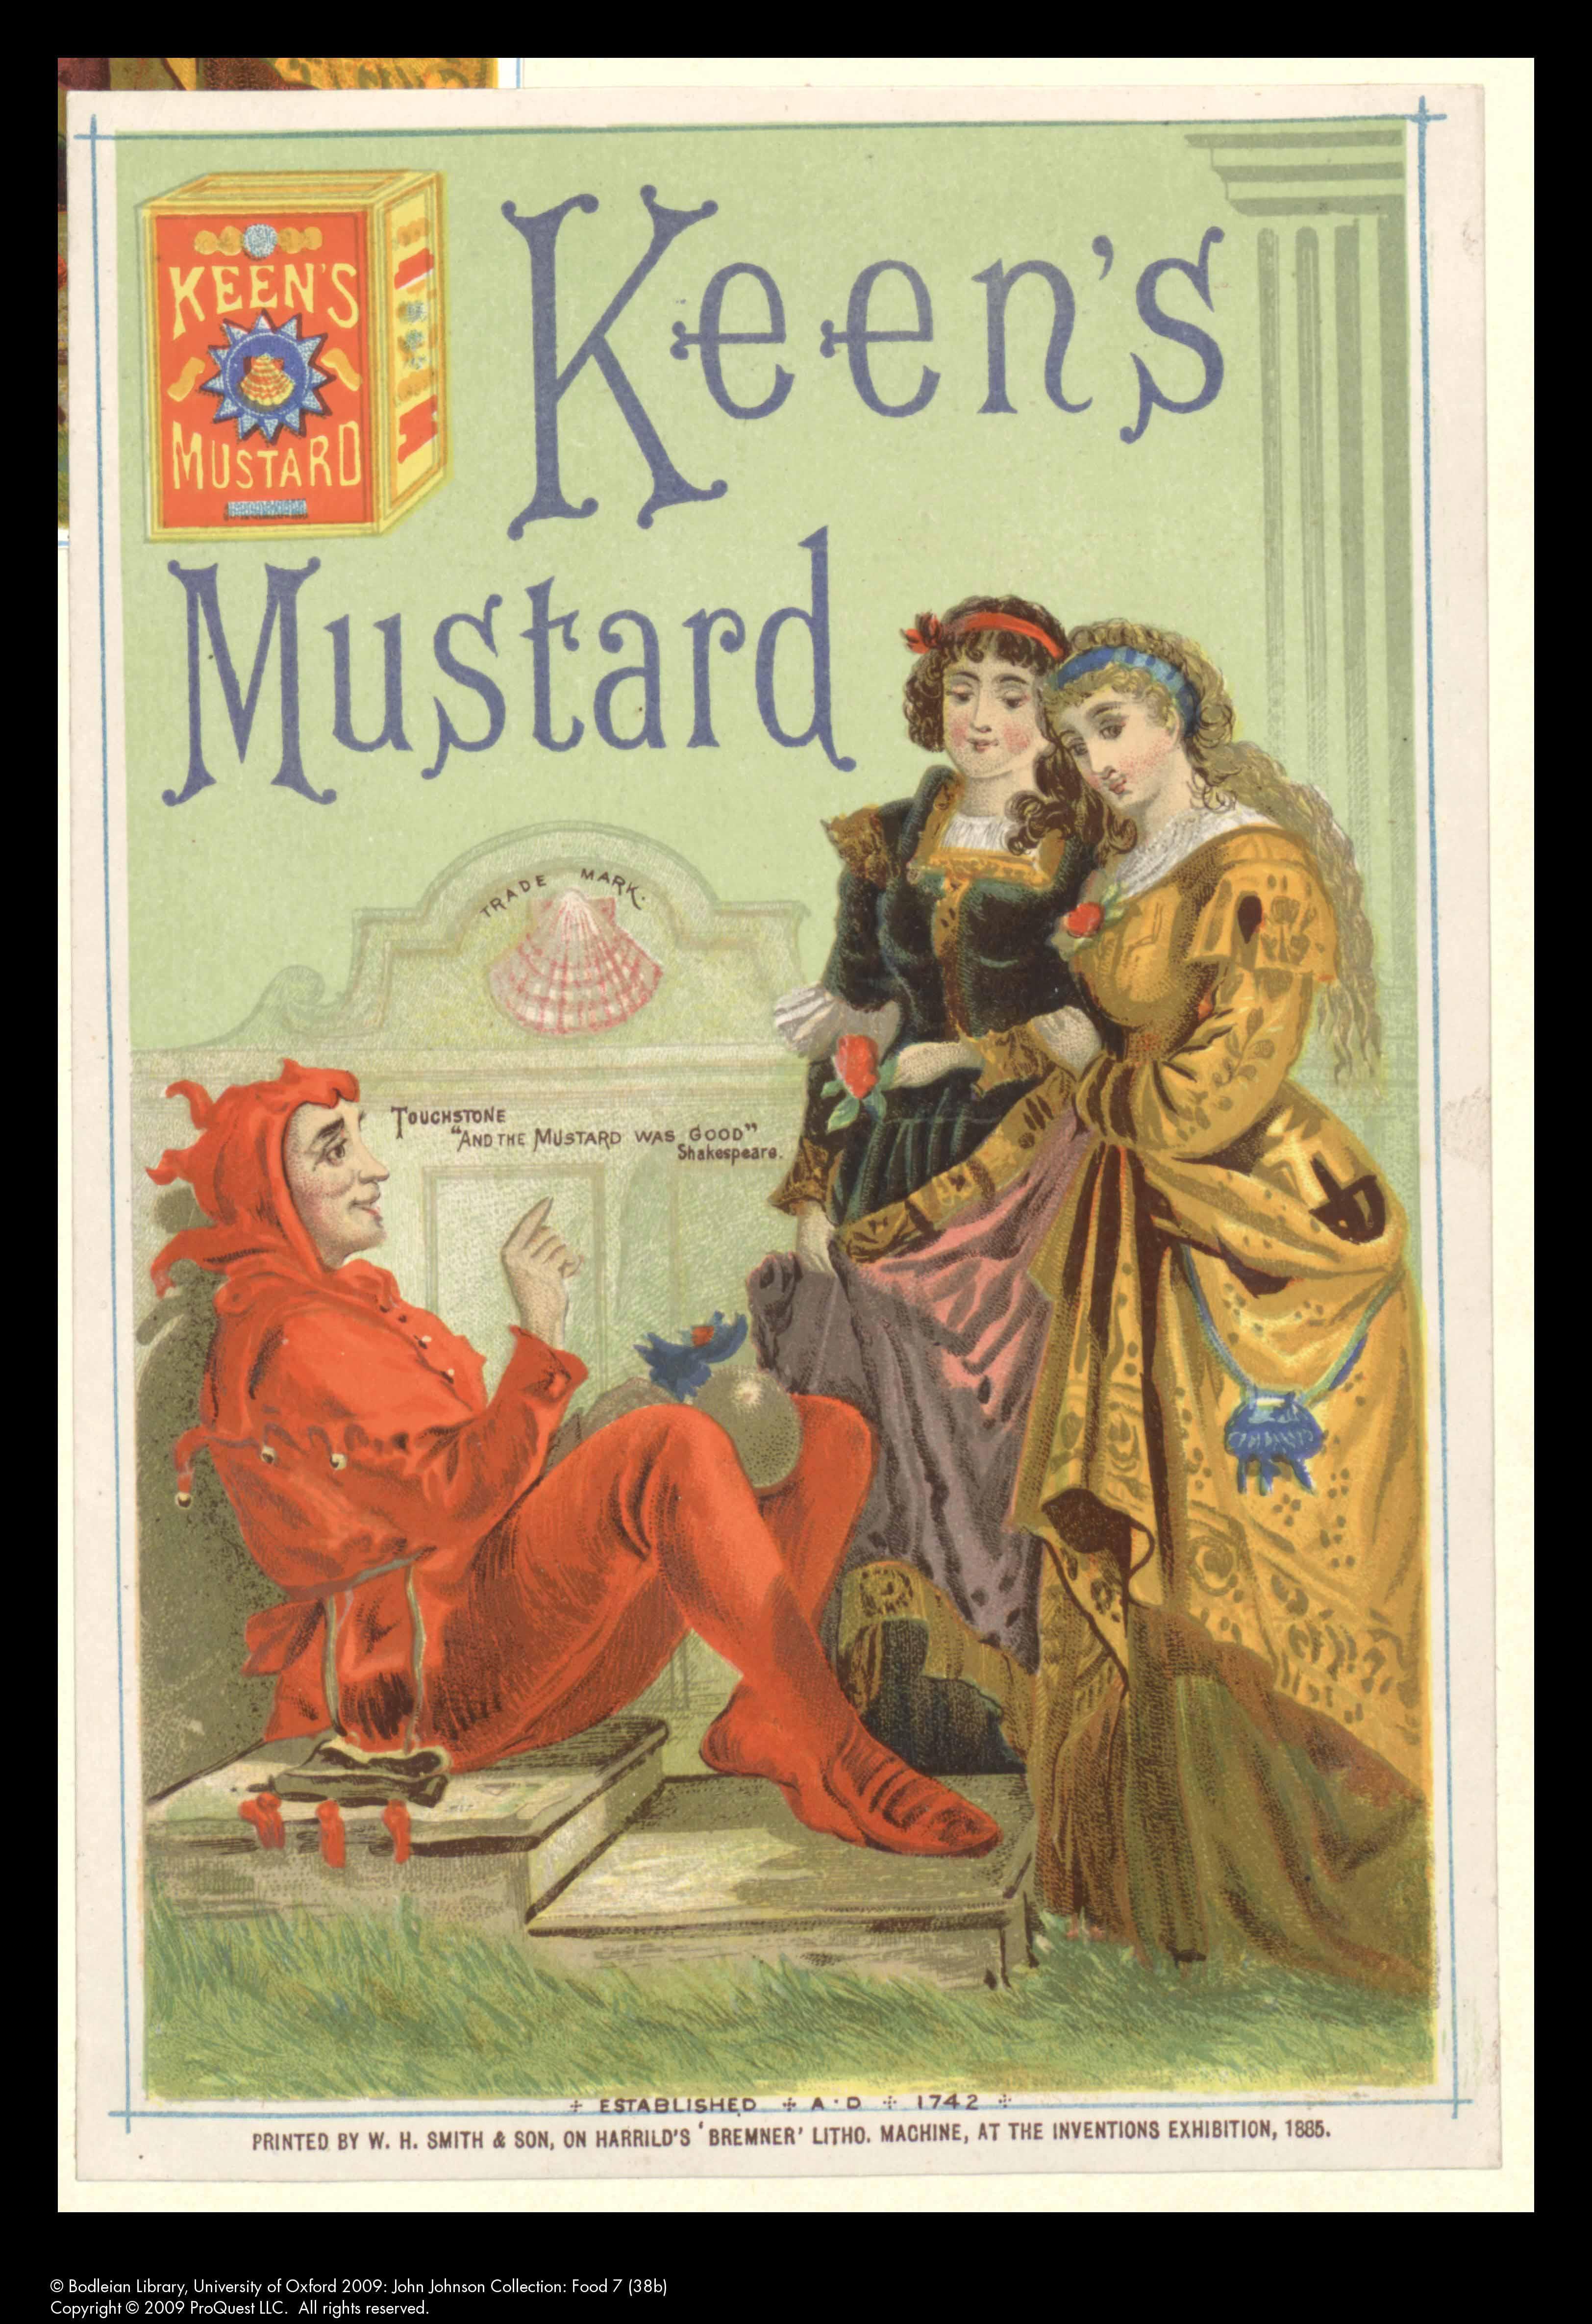 Keen's mustard ad